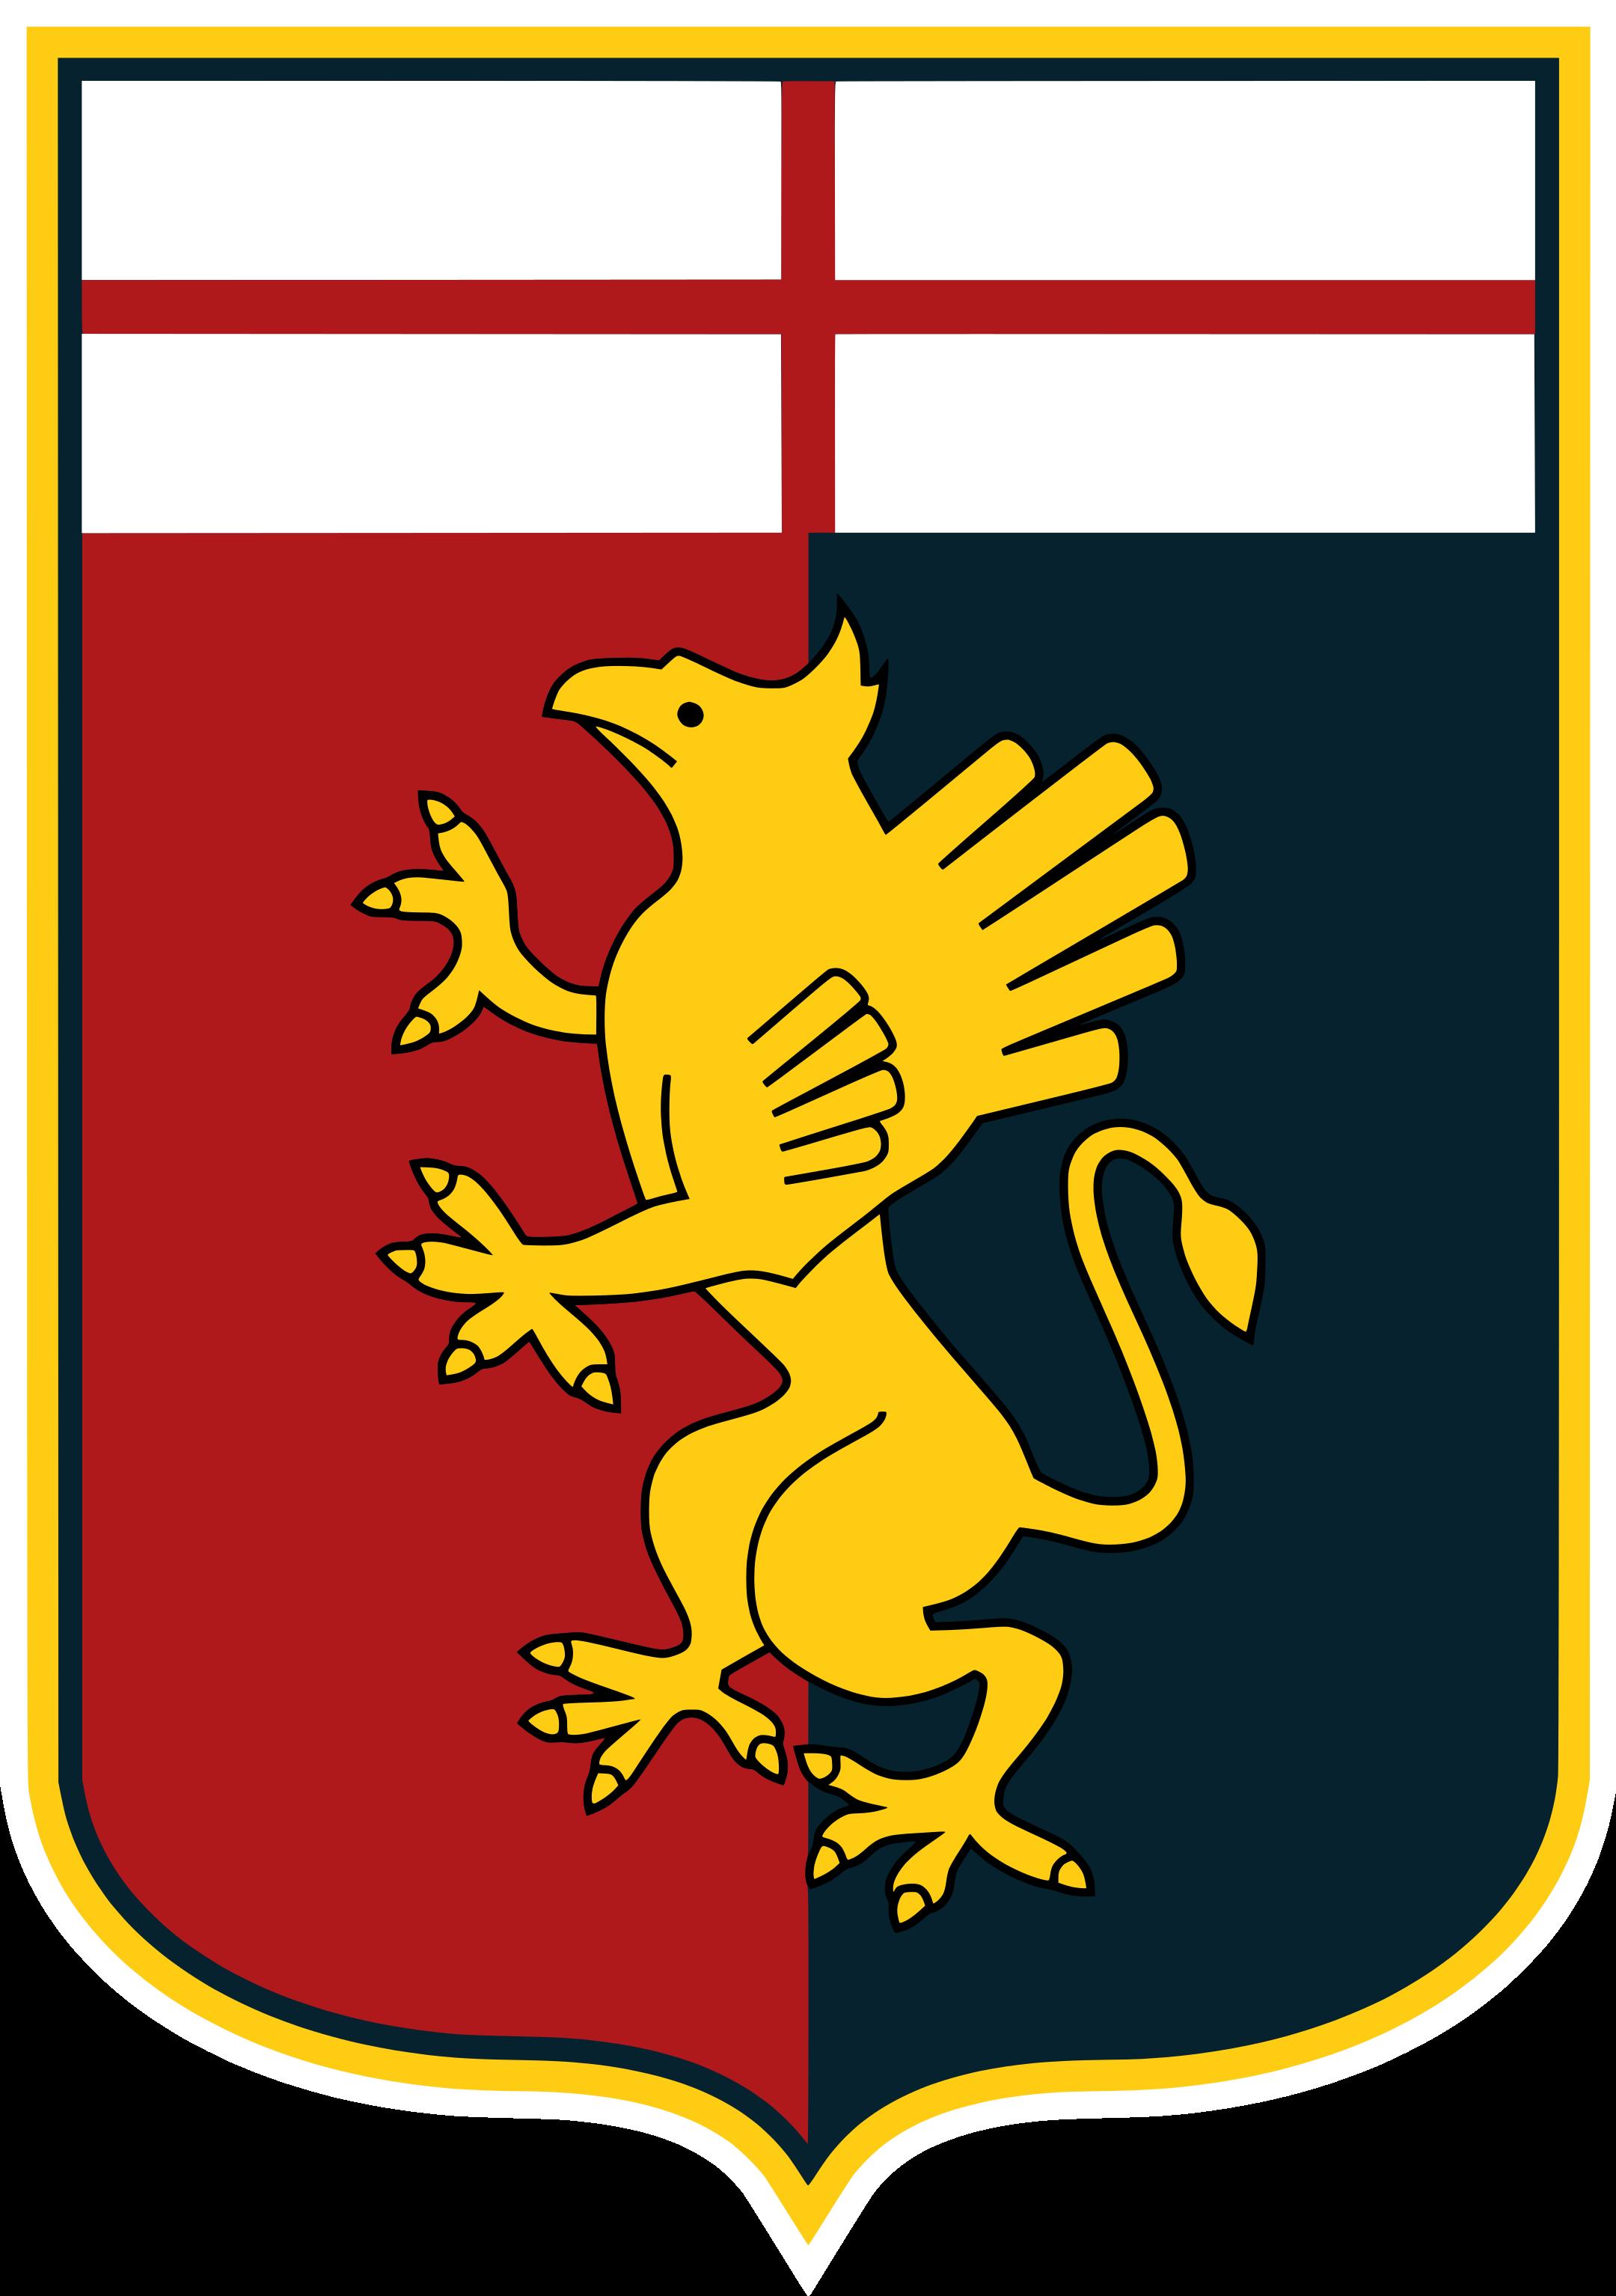 genoa fc logo 1 - Genoa FC Logo